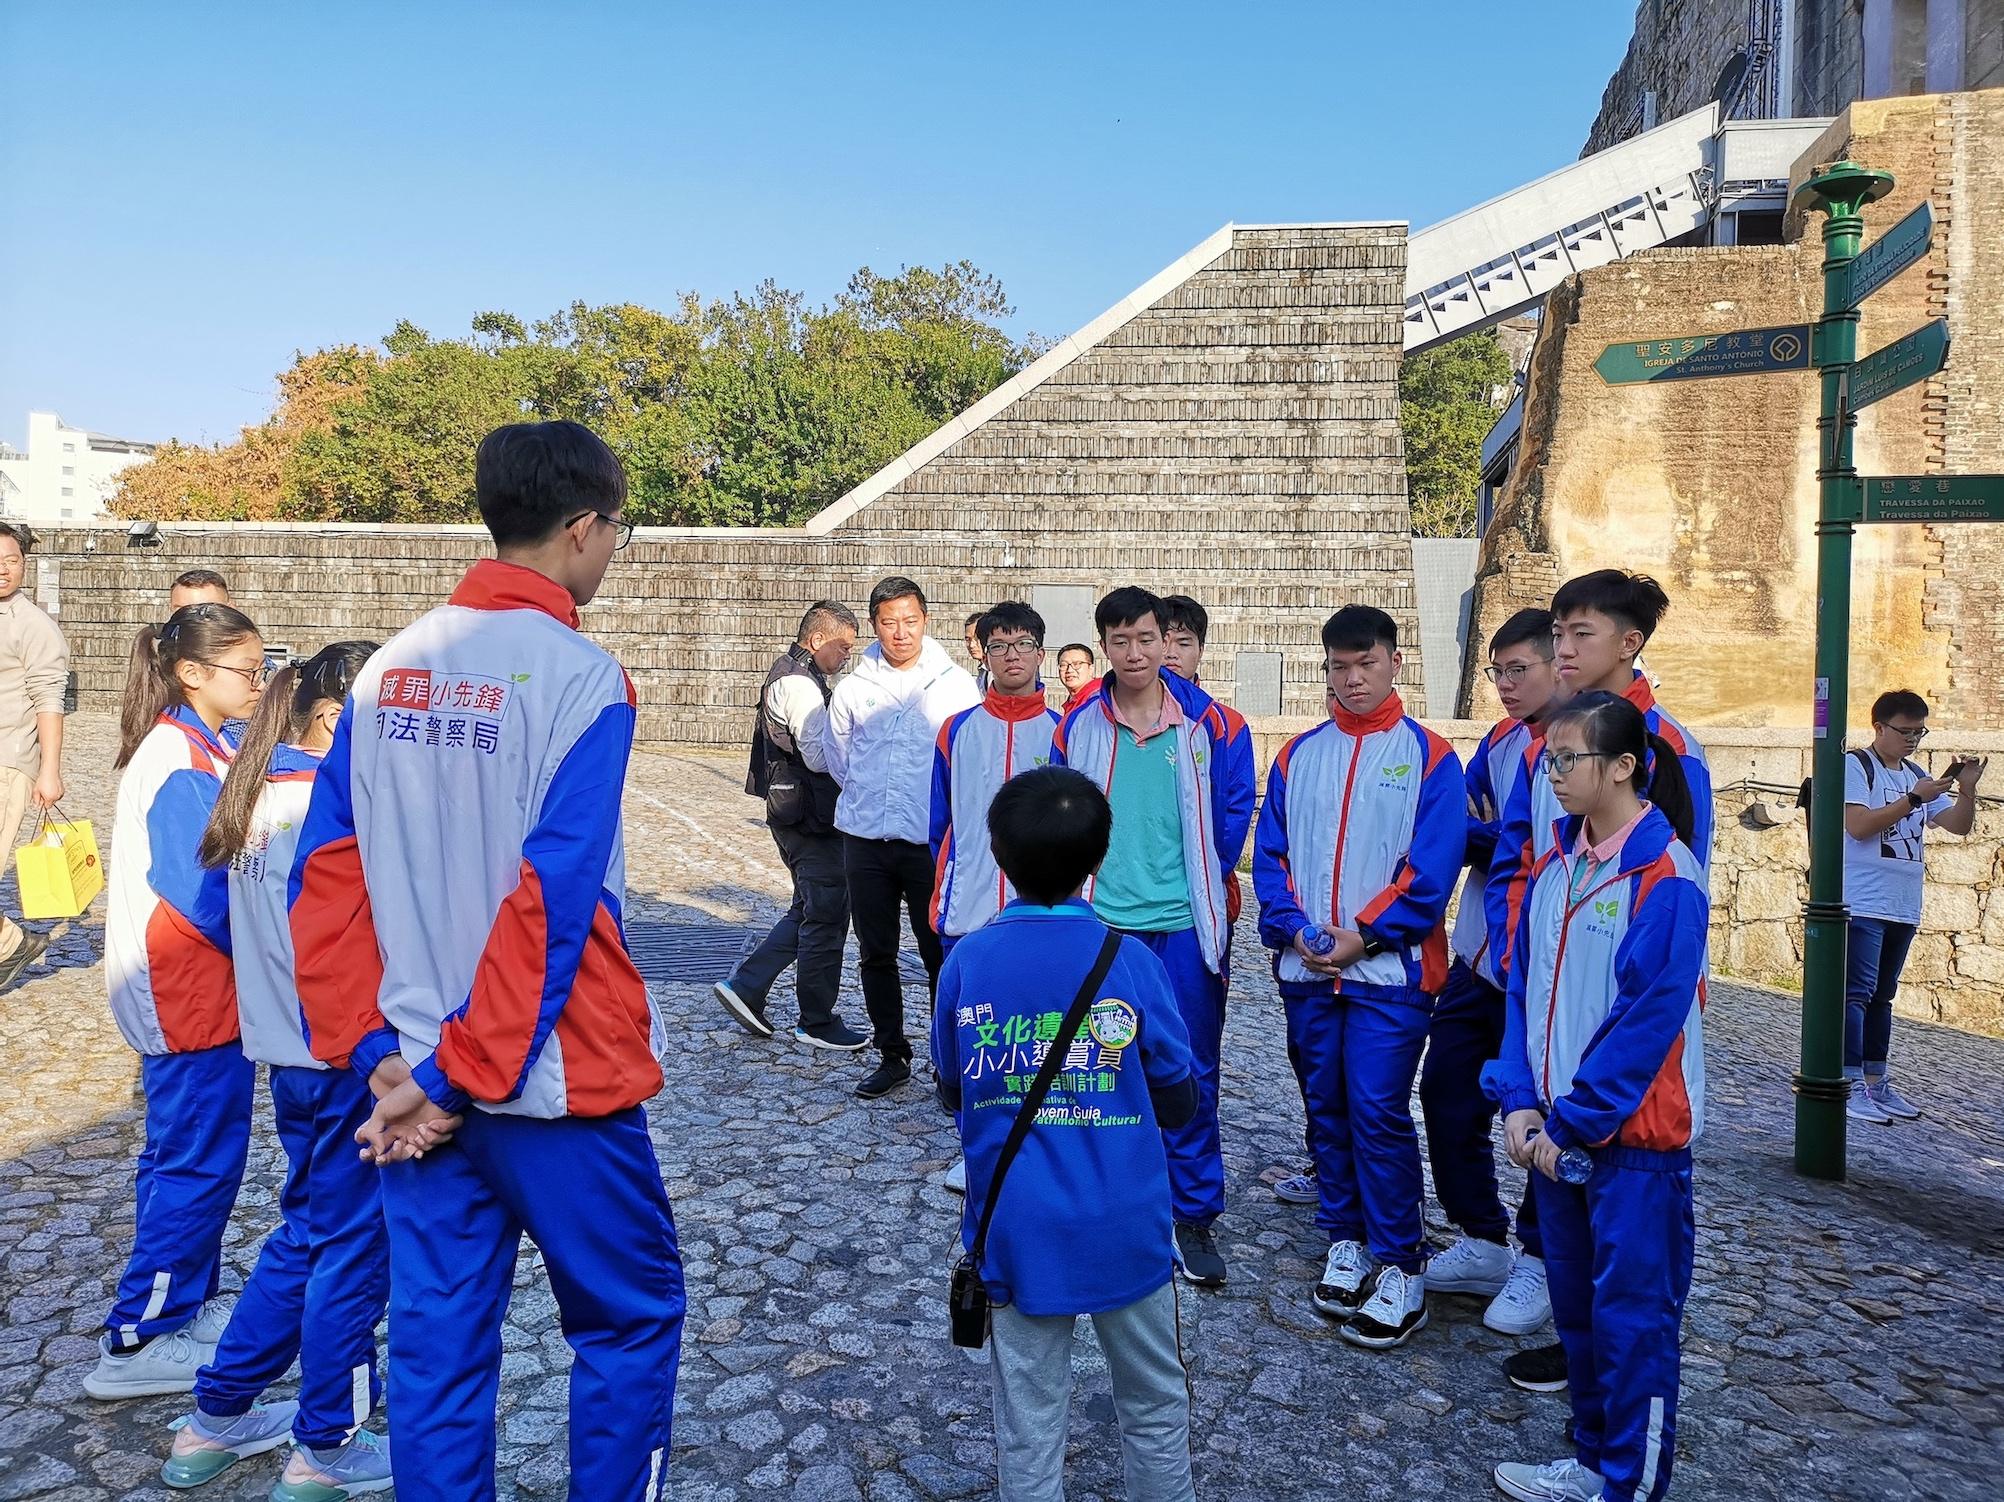 同人 A Comunidade de Macau